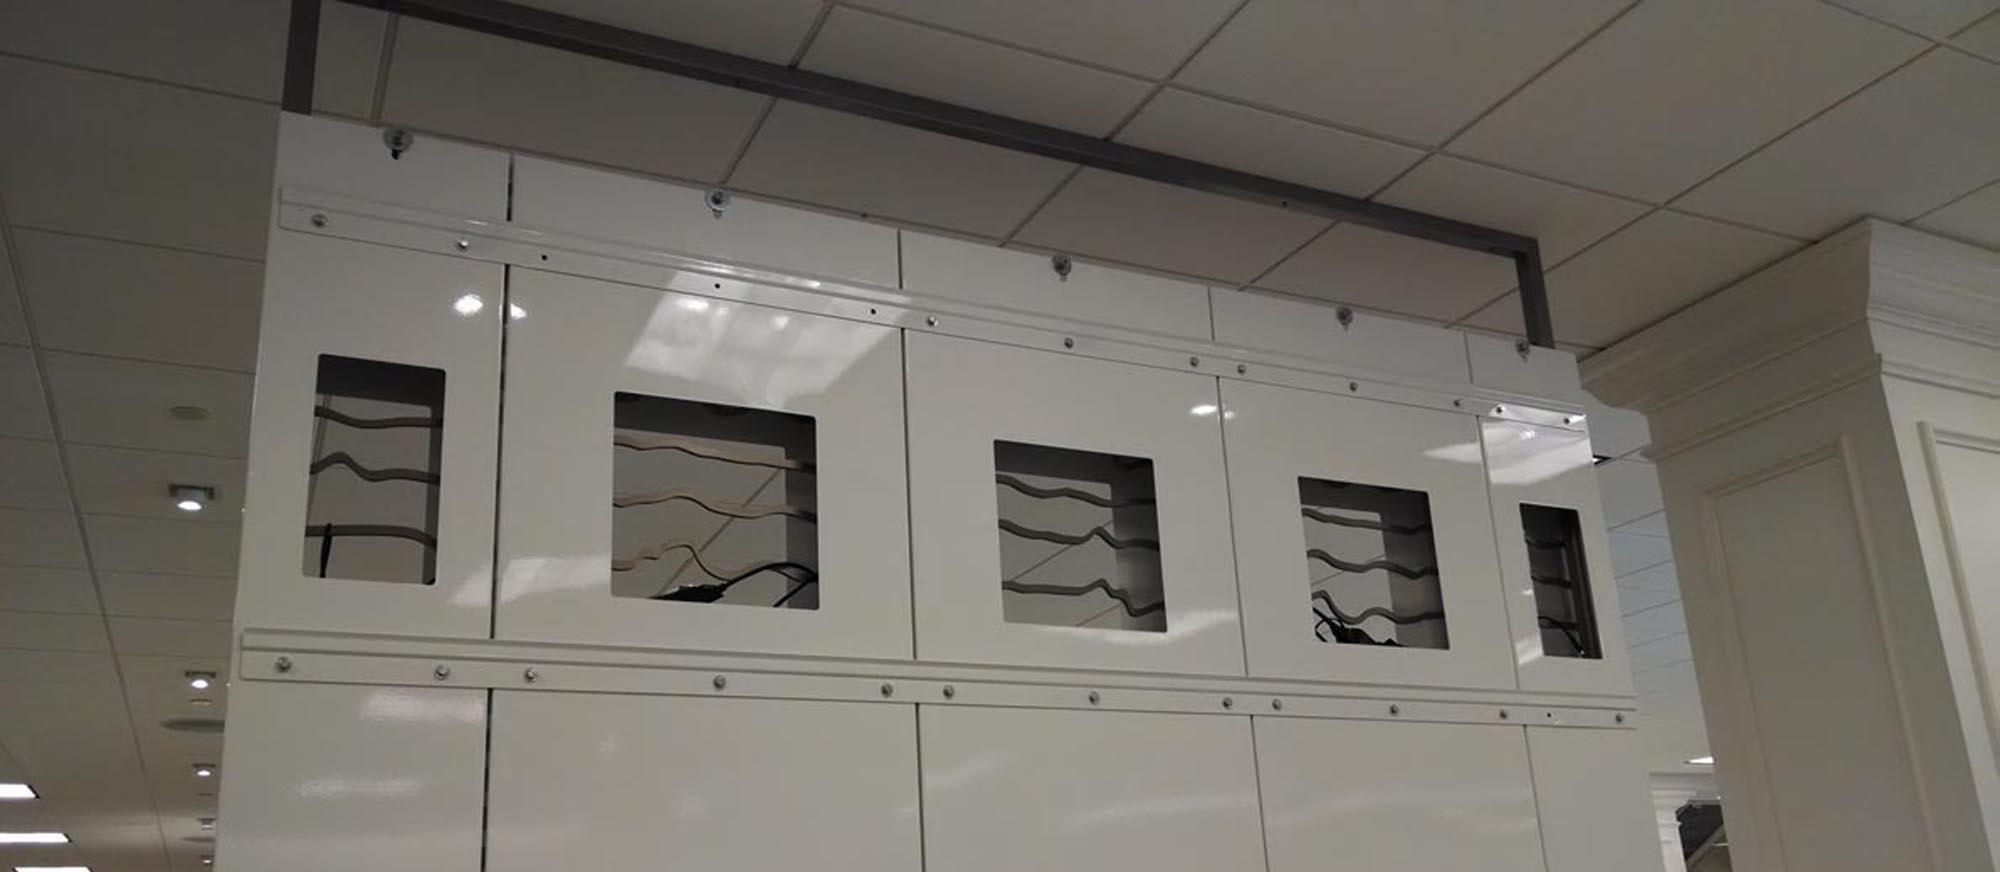 retail industry store installation, signage, brand identity, VDI